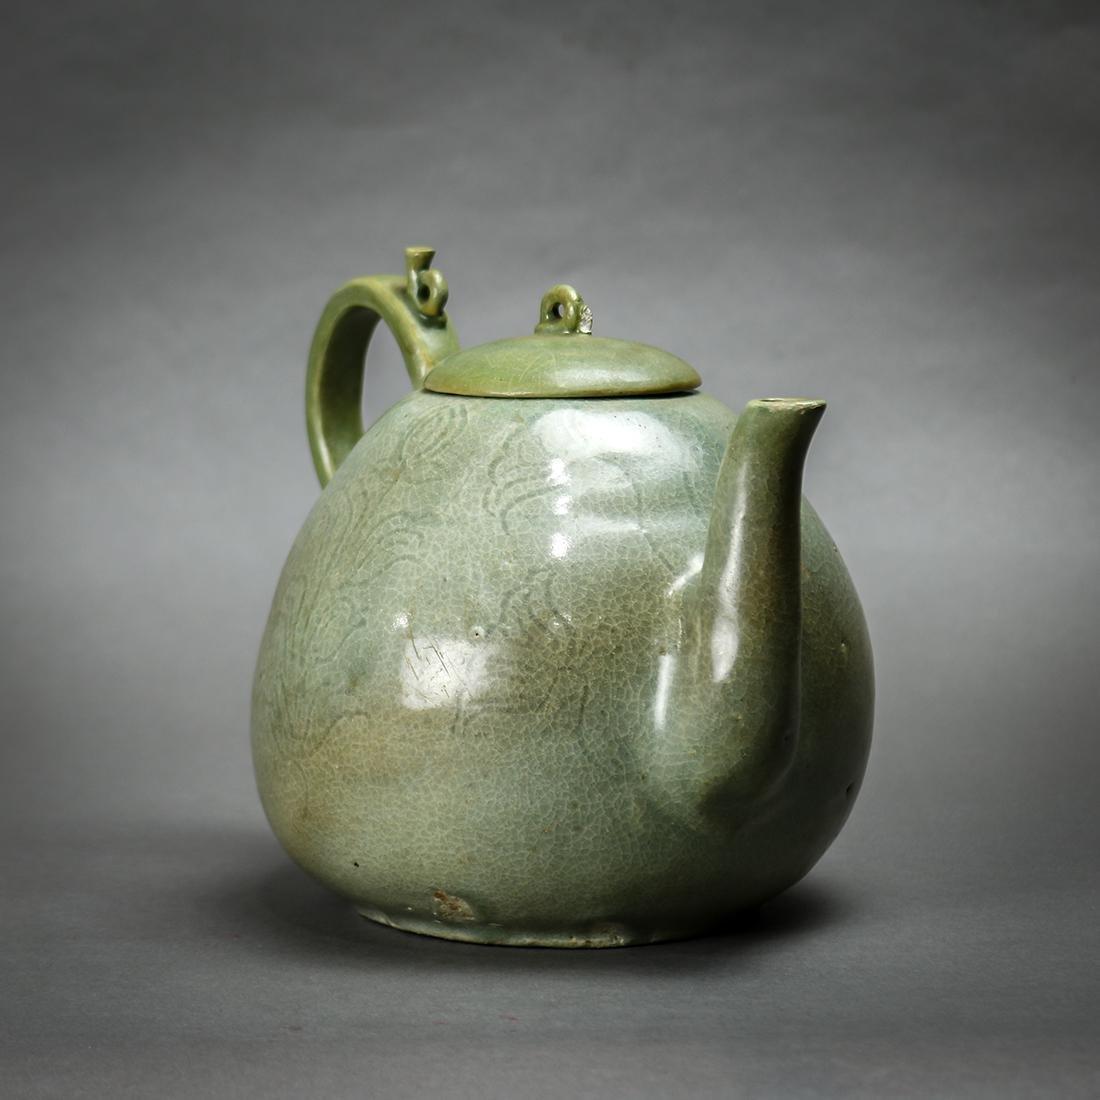 Korean Celadon Ceramic Teapot - 3